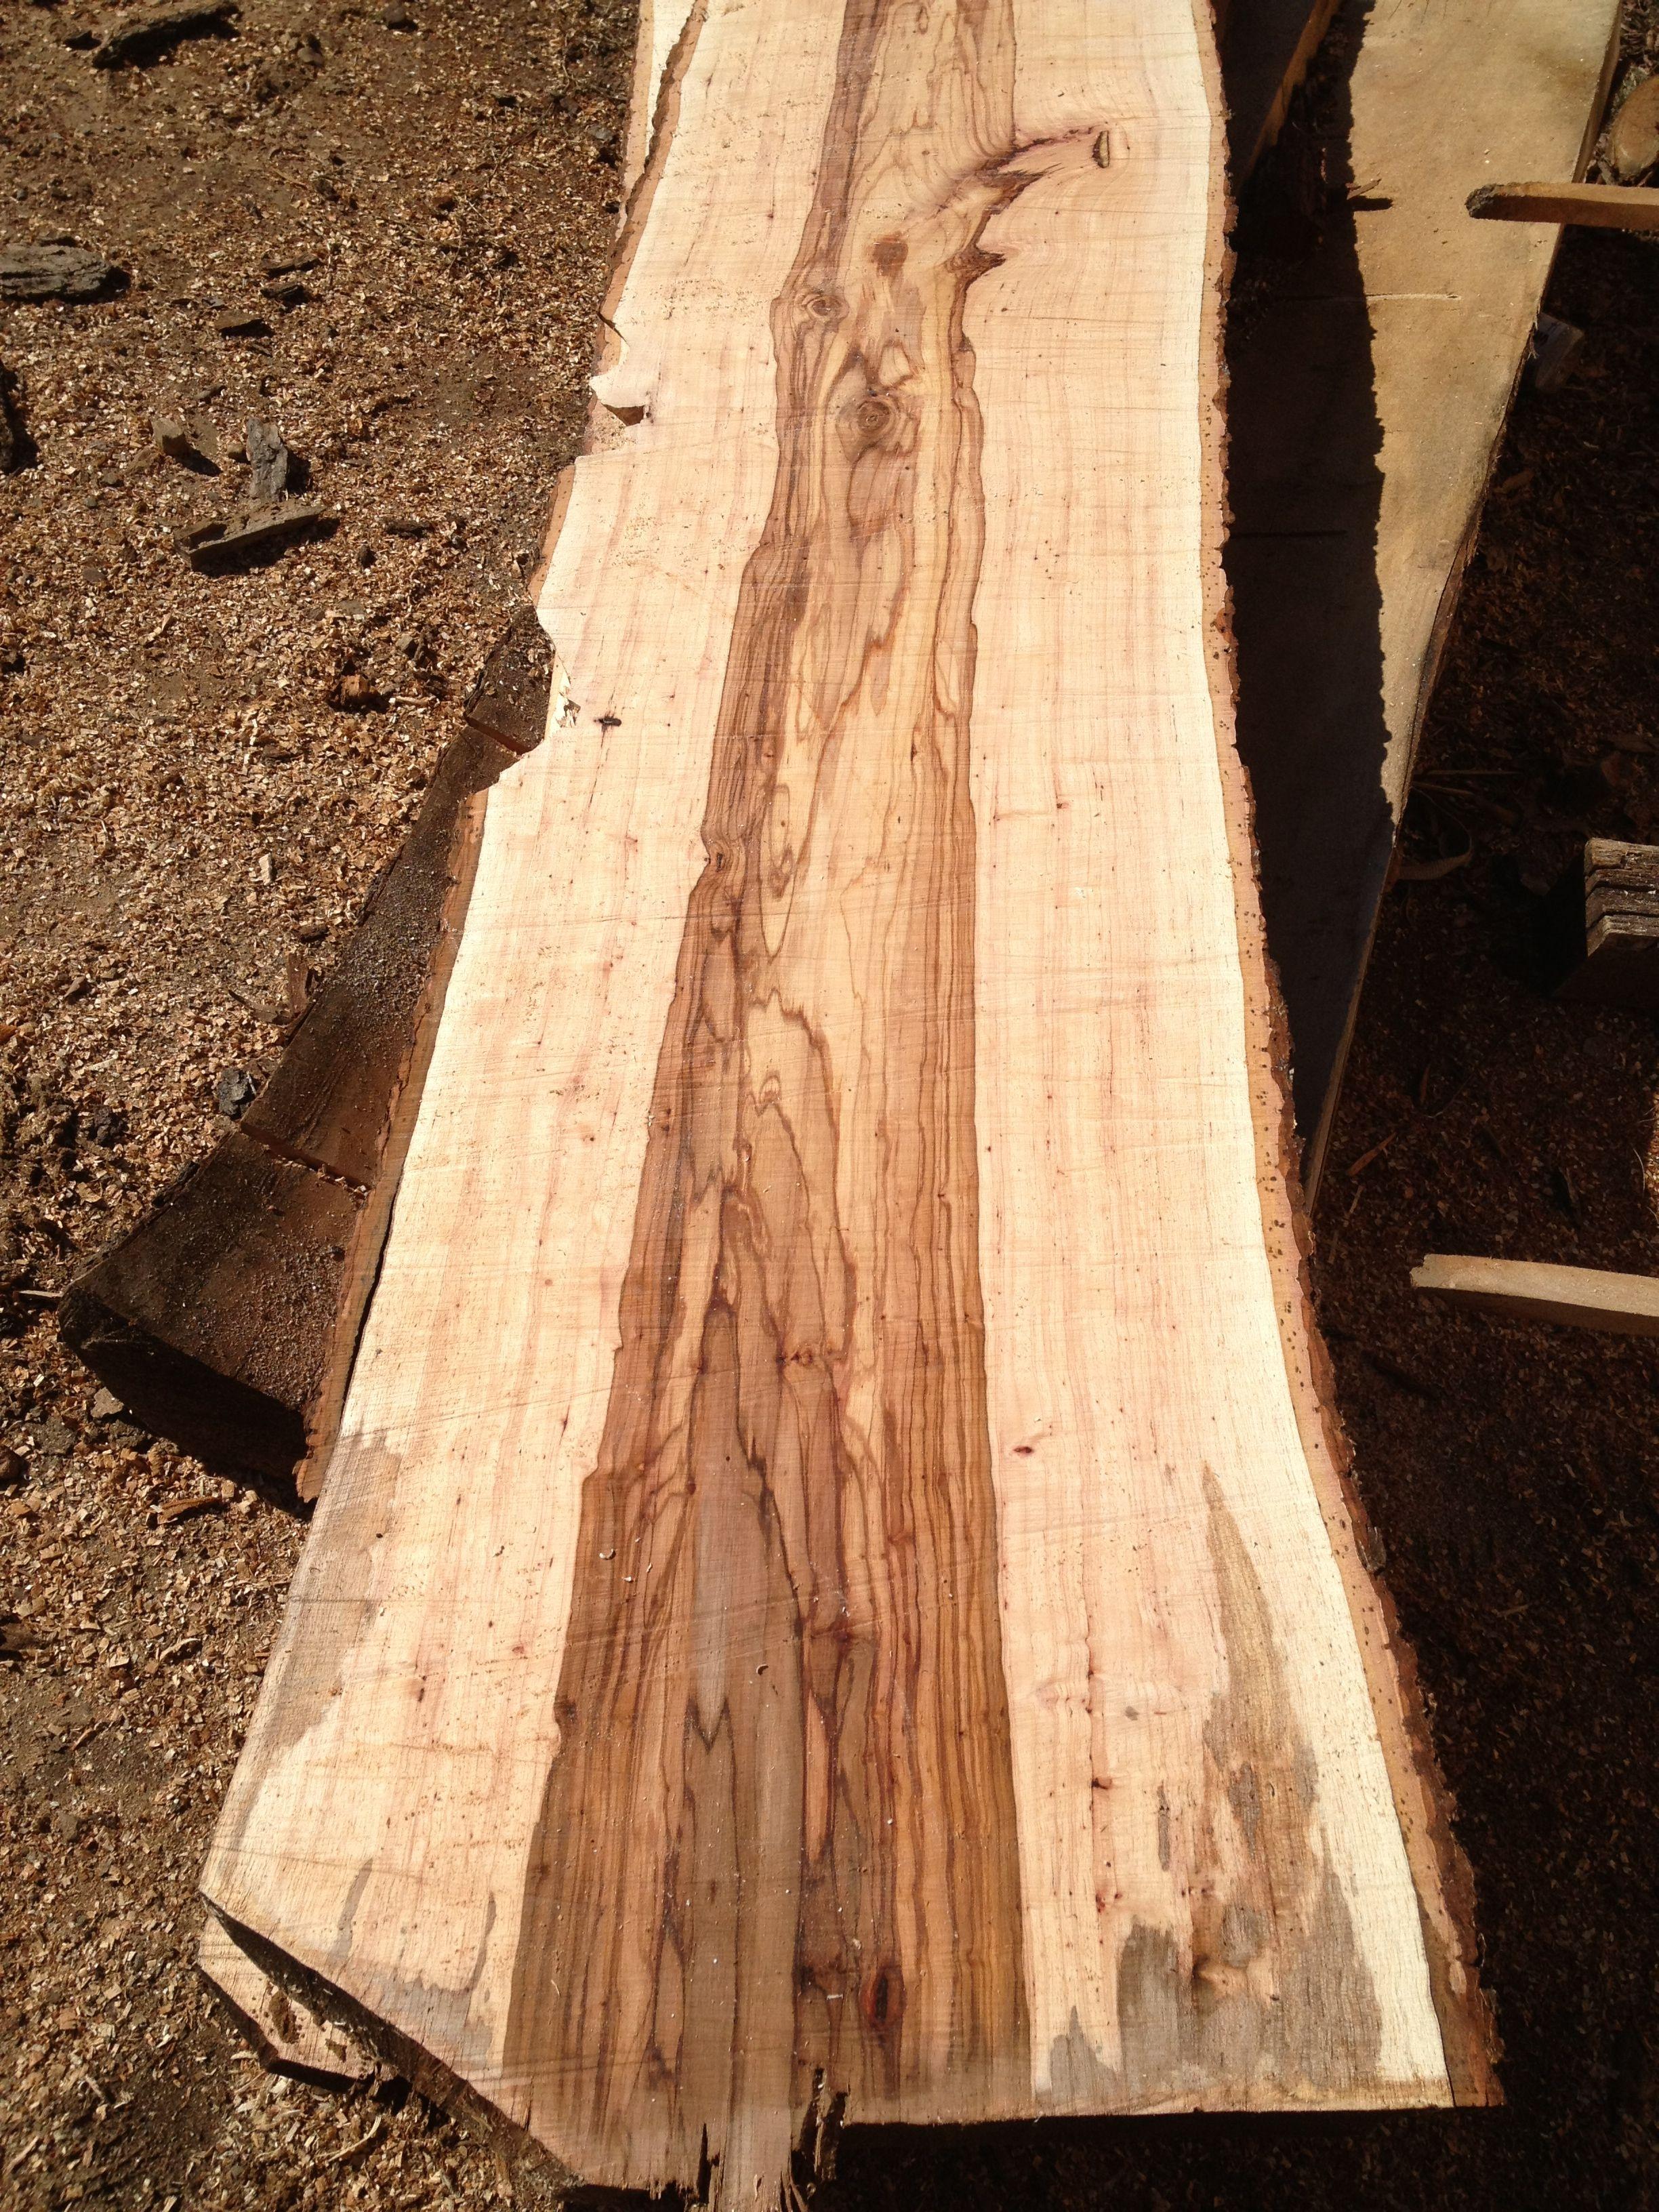 600 Board Feet Of Pecan Lumber